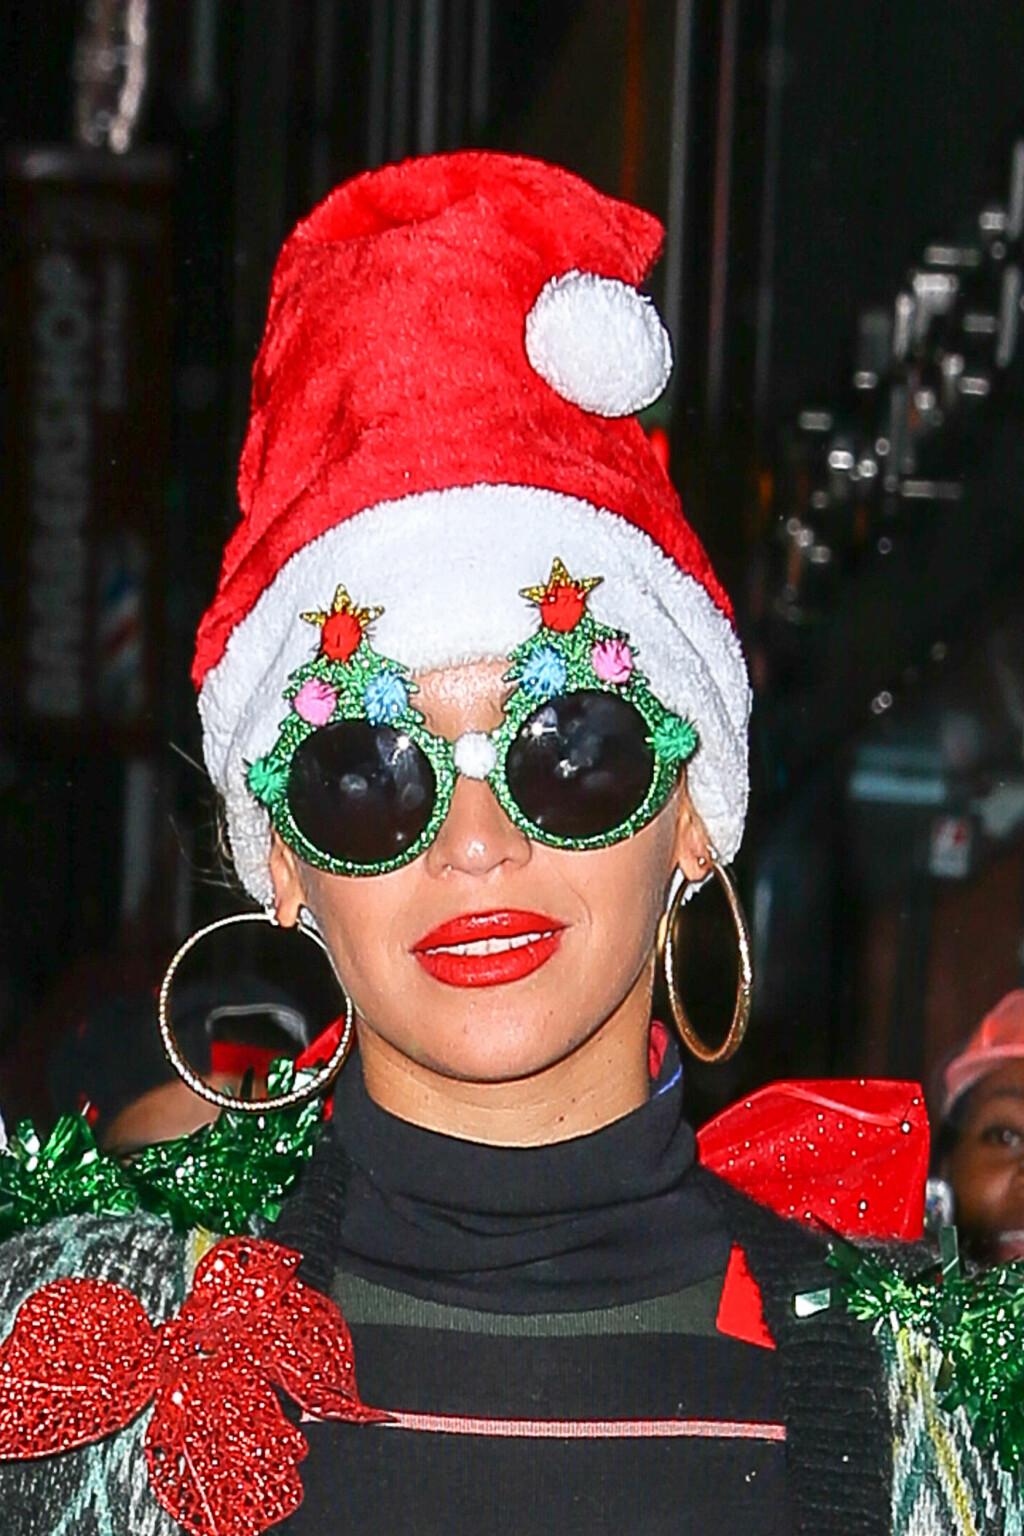 JULESTIL: Beyoncé tok julefesten helt ut med juletrebriller og julenisselue.  Foto: Splash News